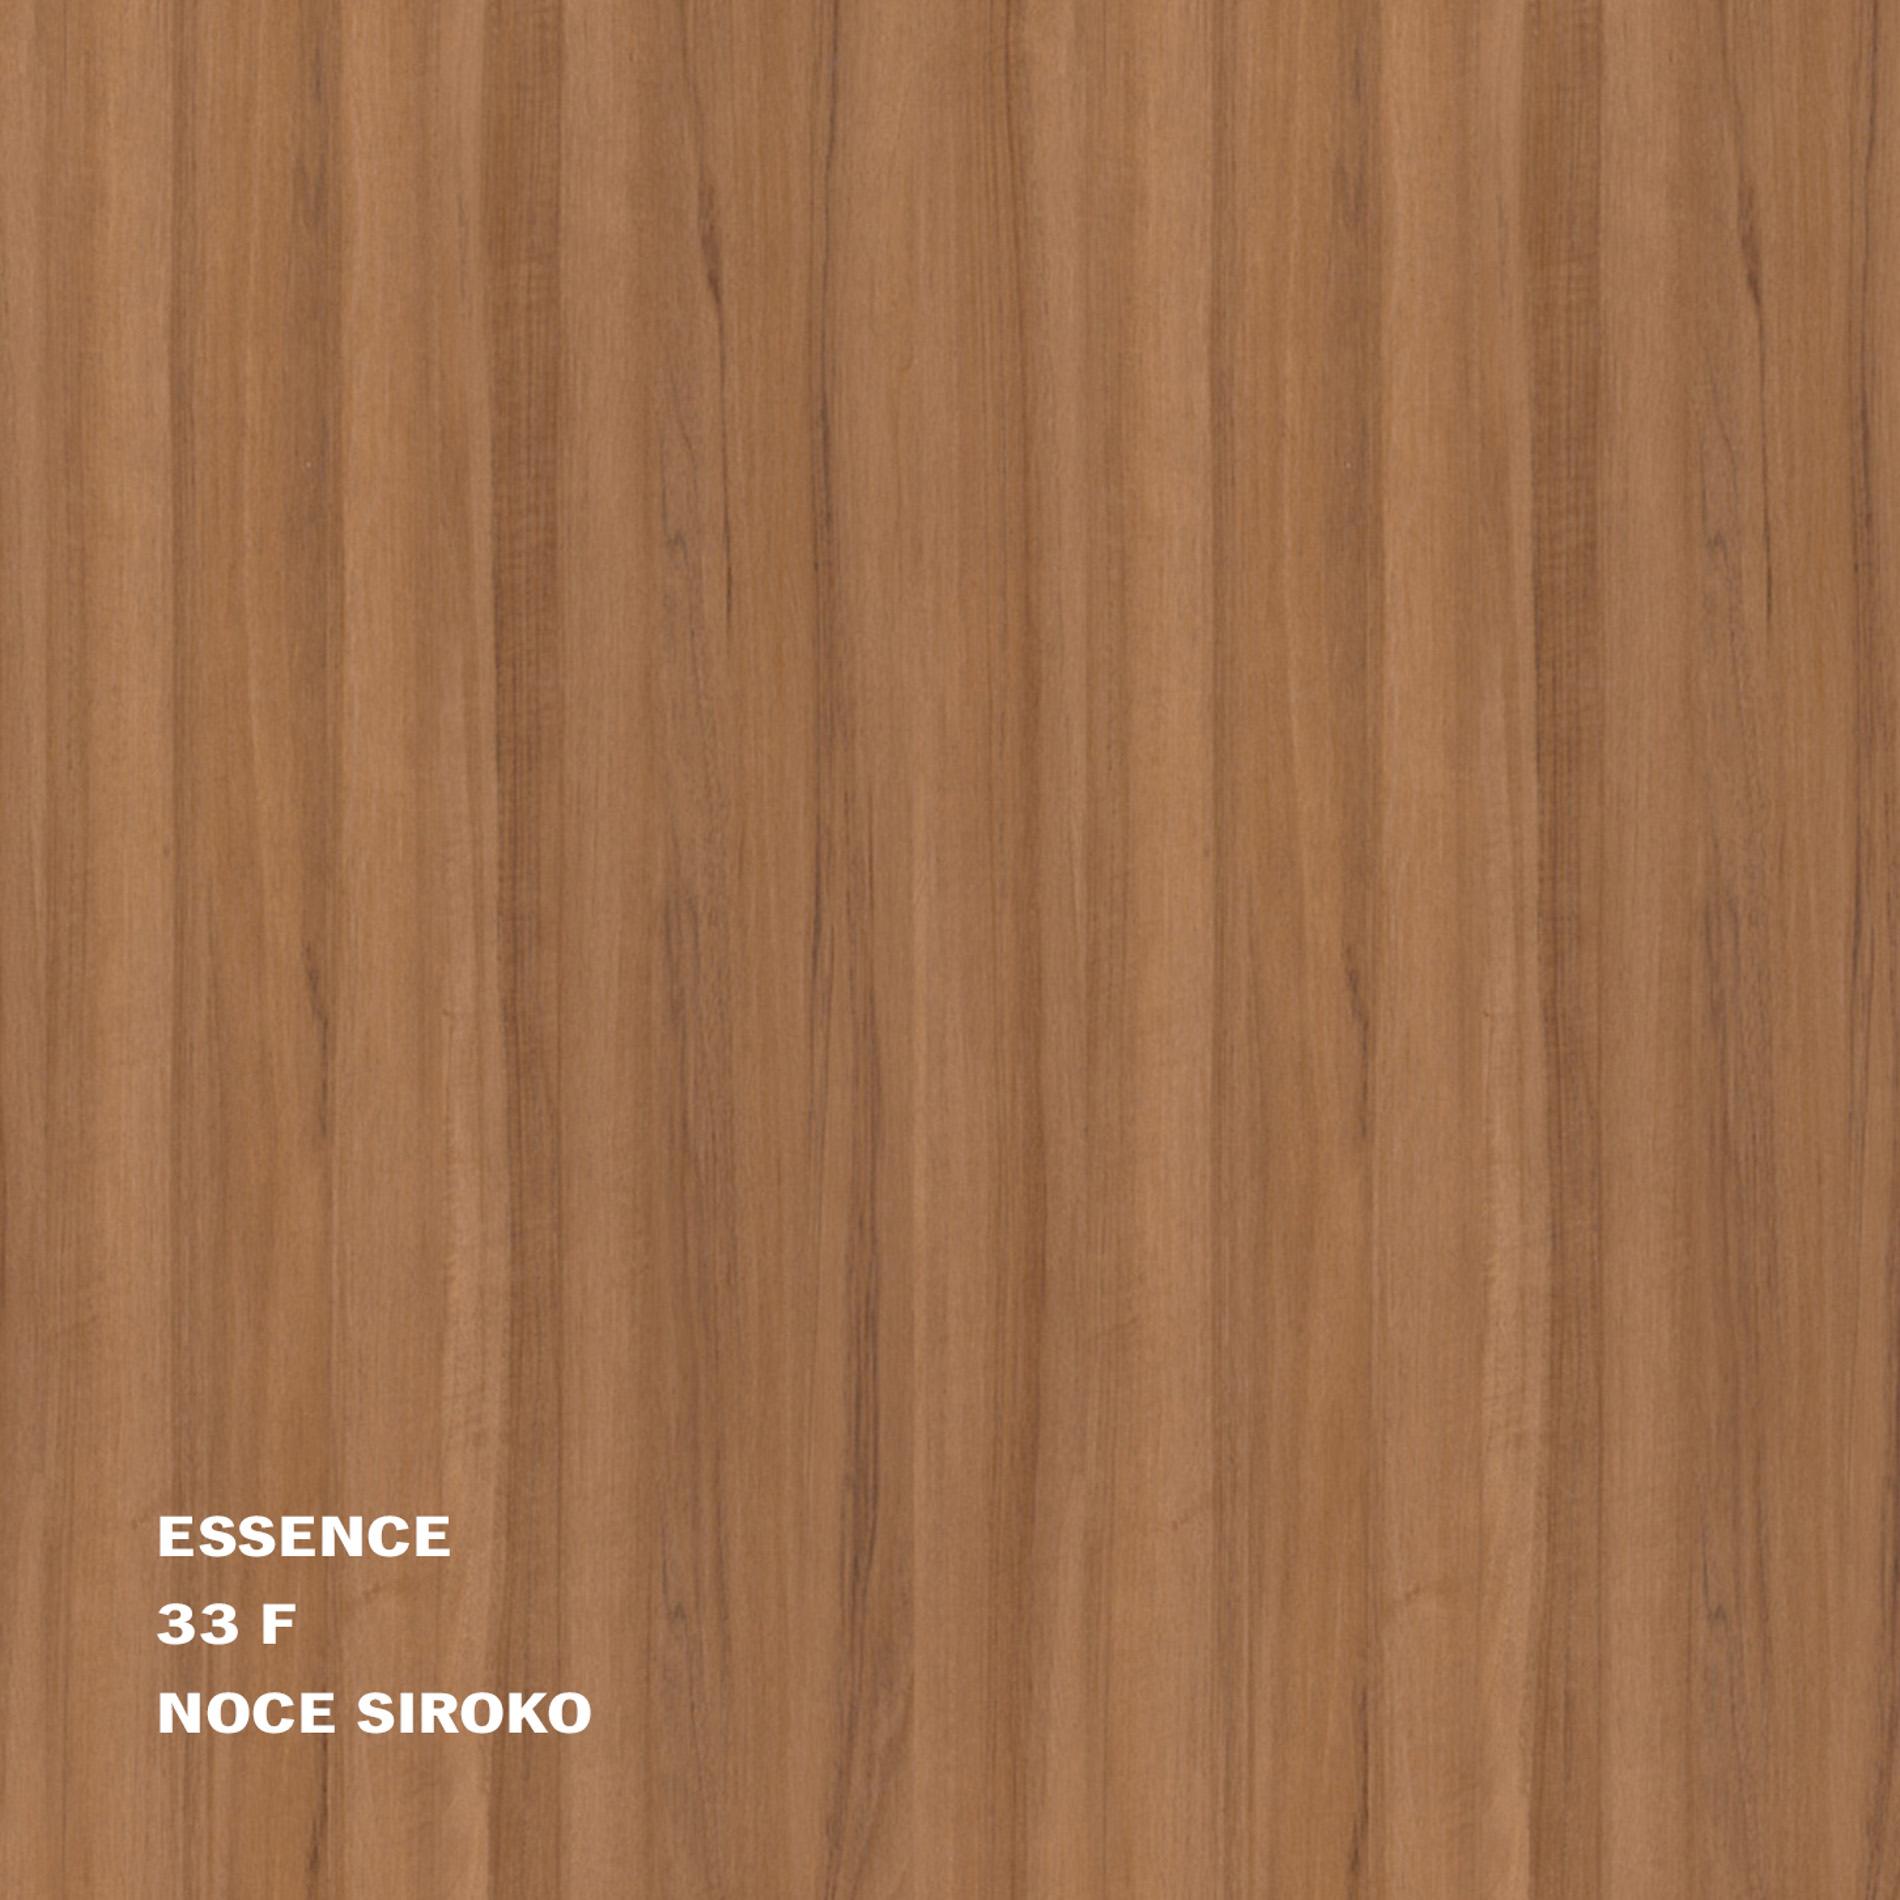 33F_NOCE SIROKO_ESSENCE